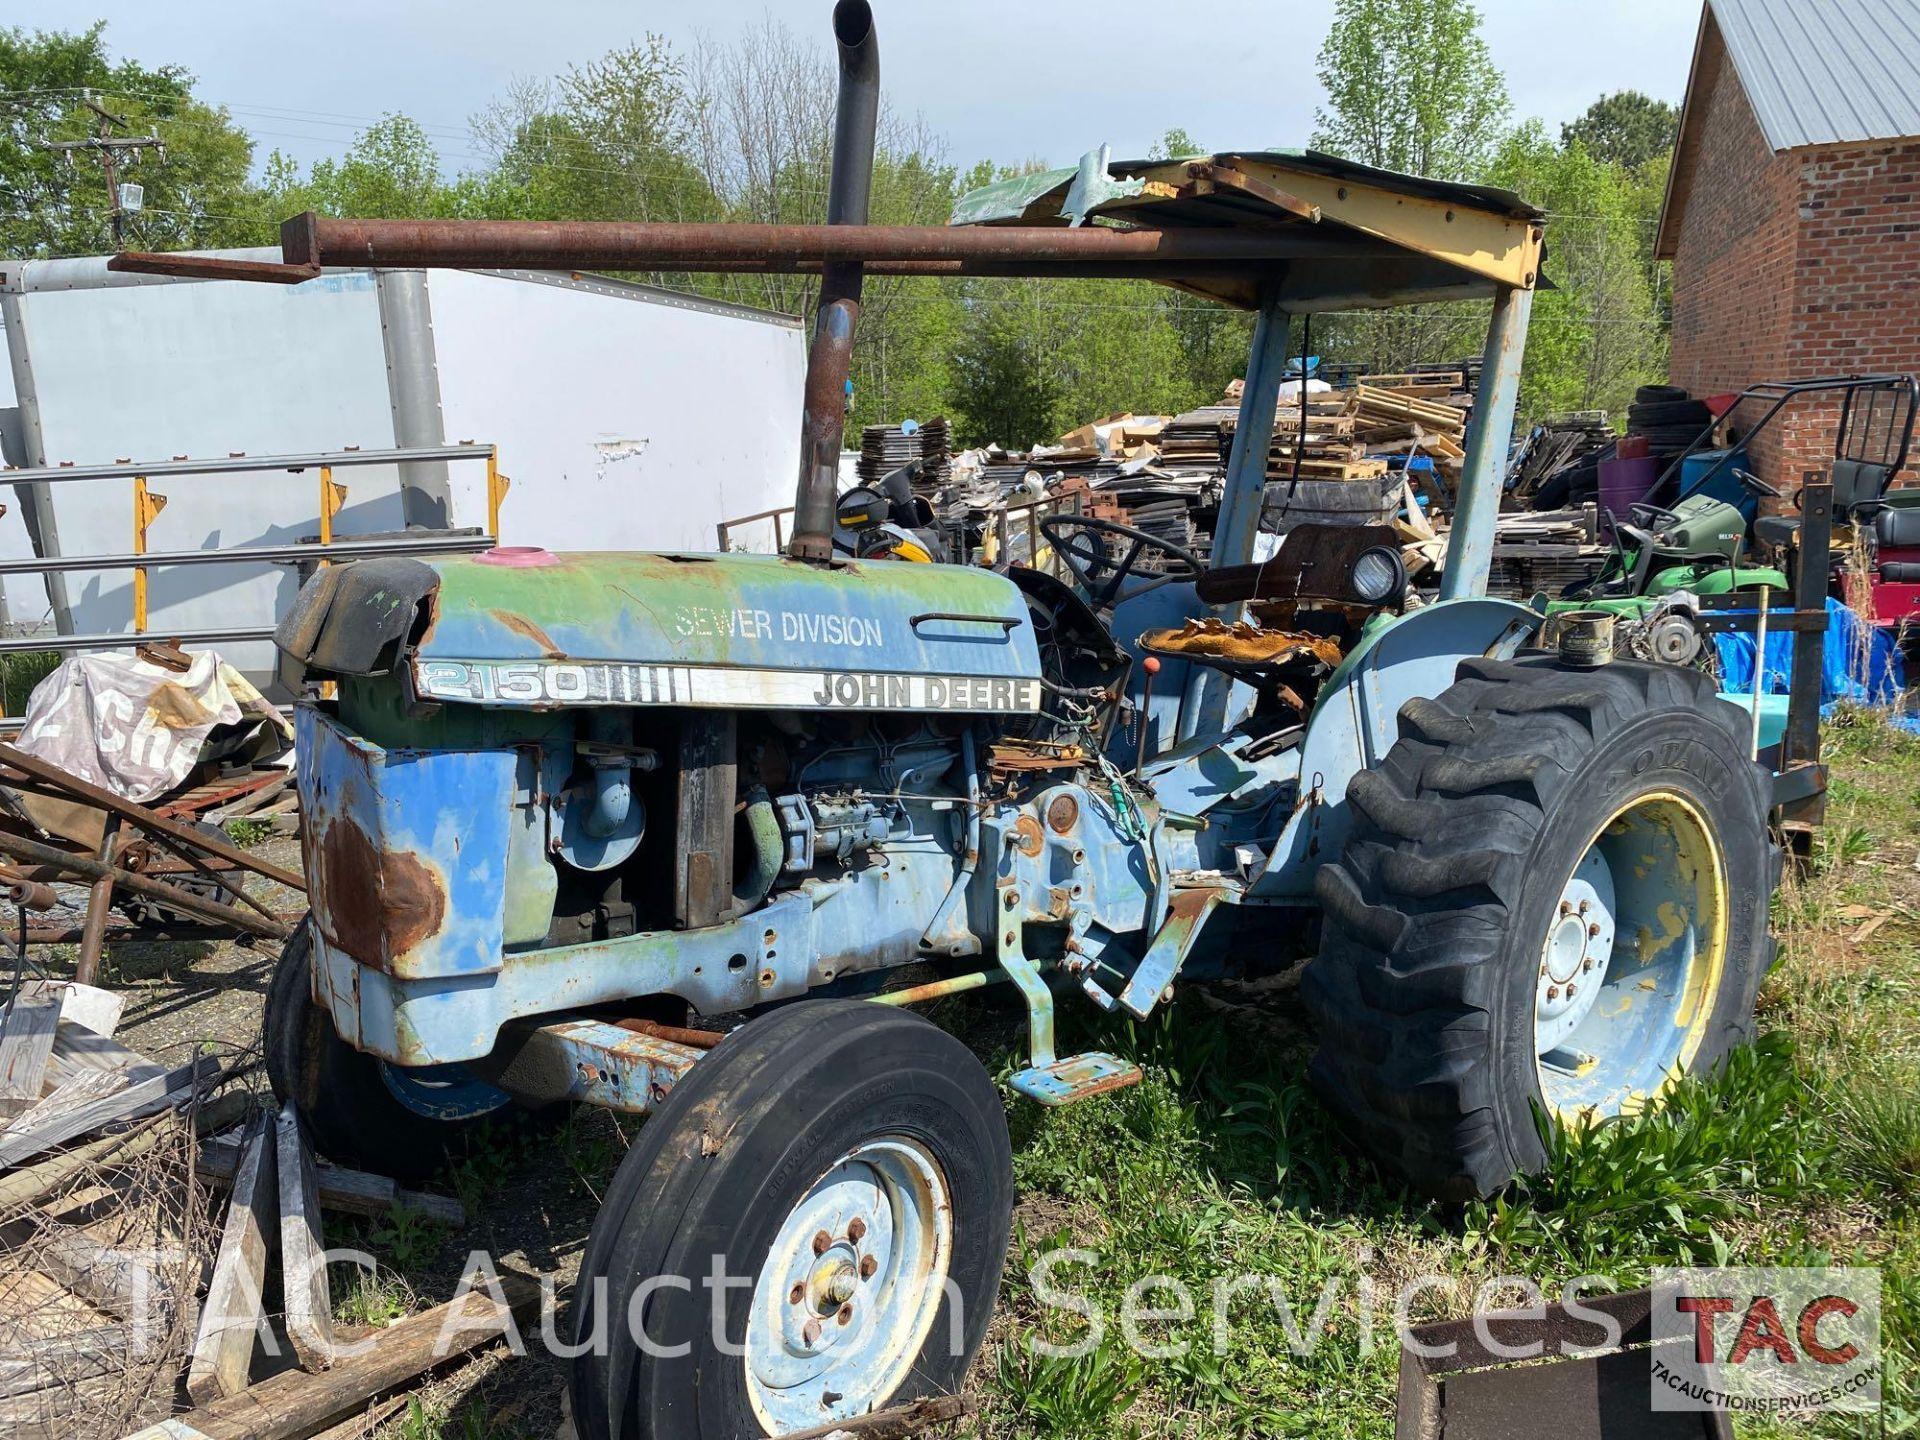 John Deere 2150 Farm Tractor - Image 3 of 34